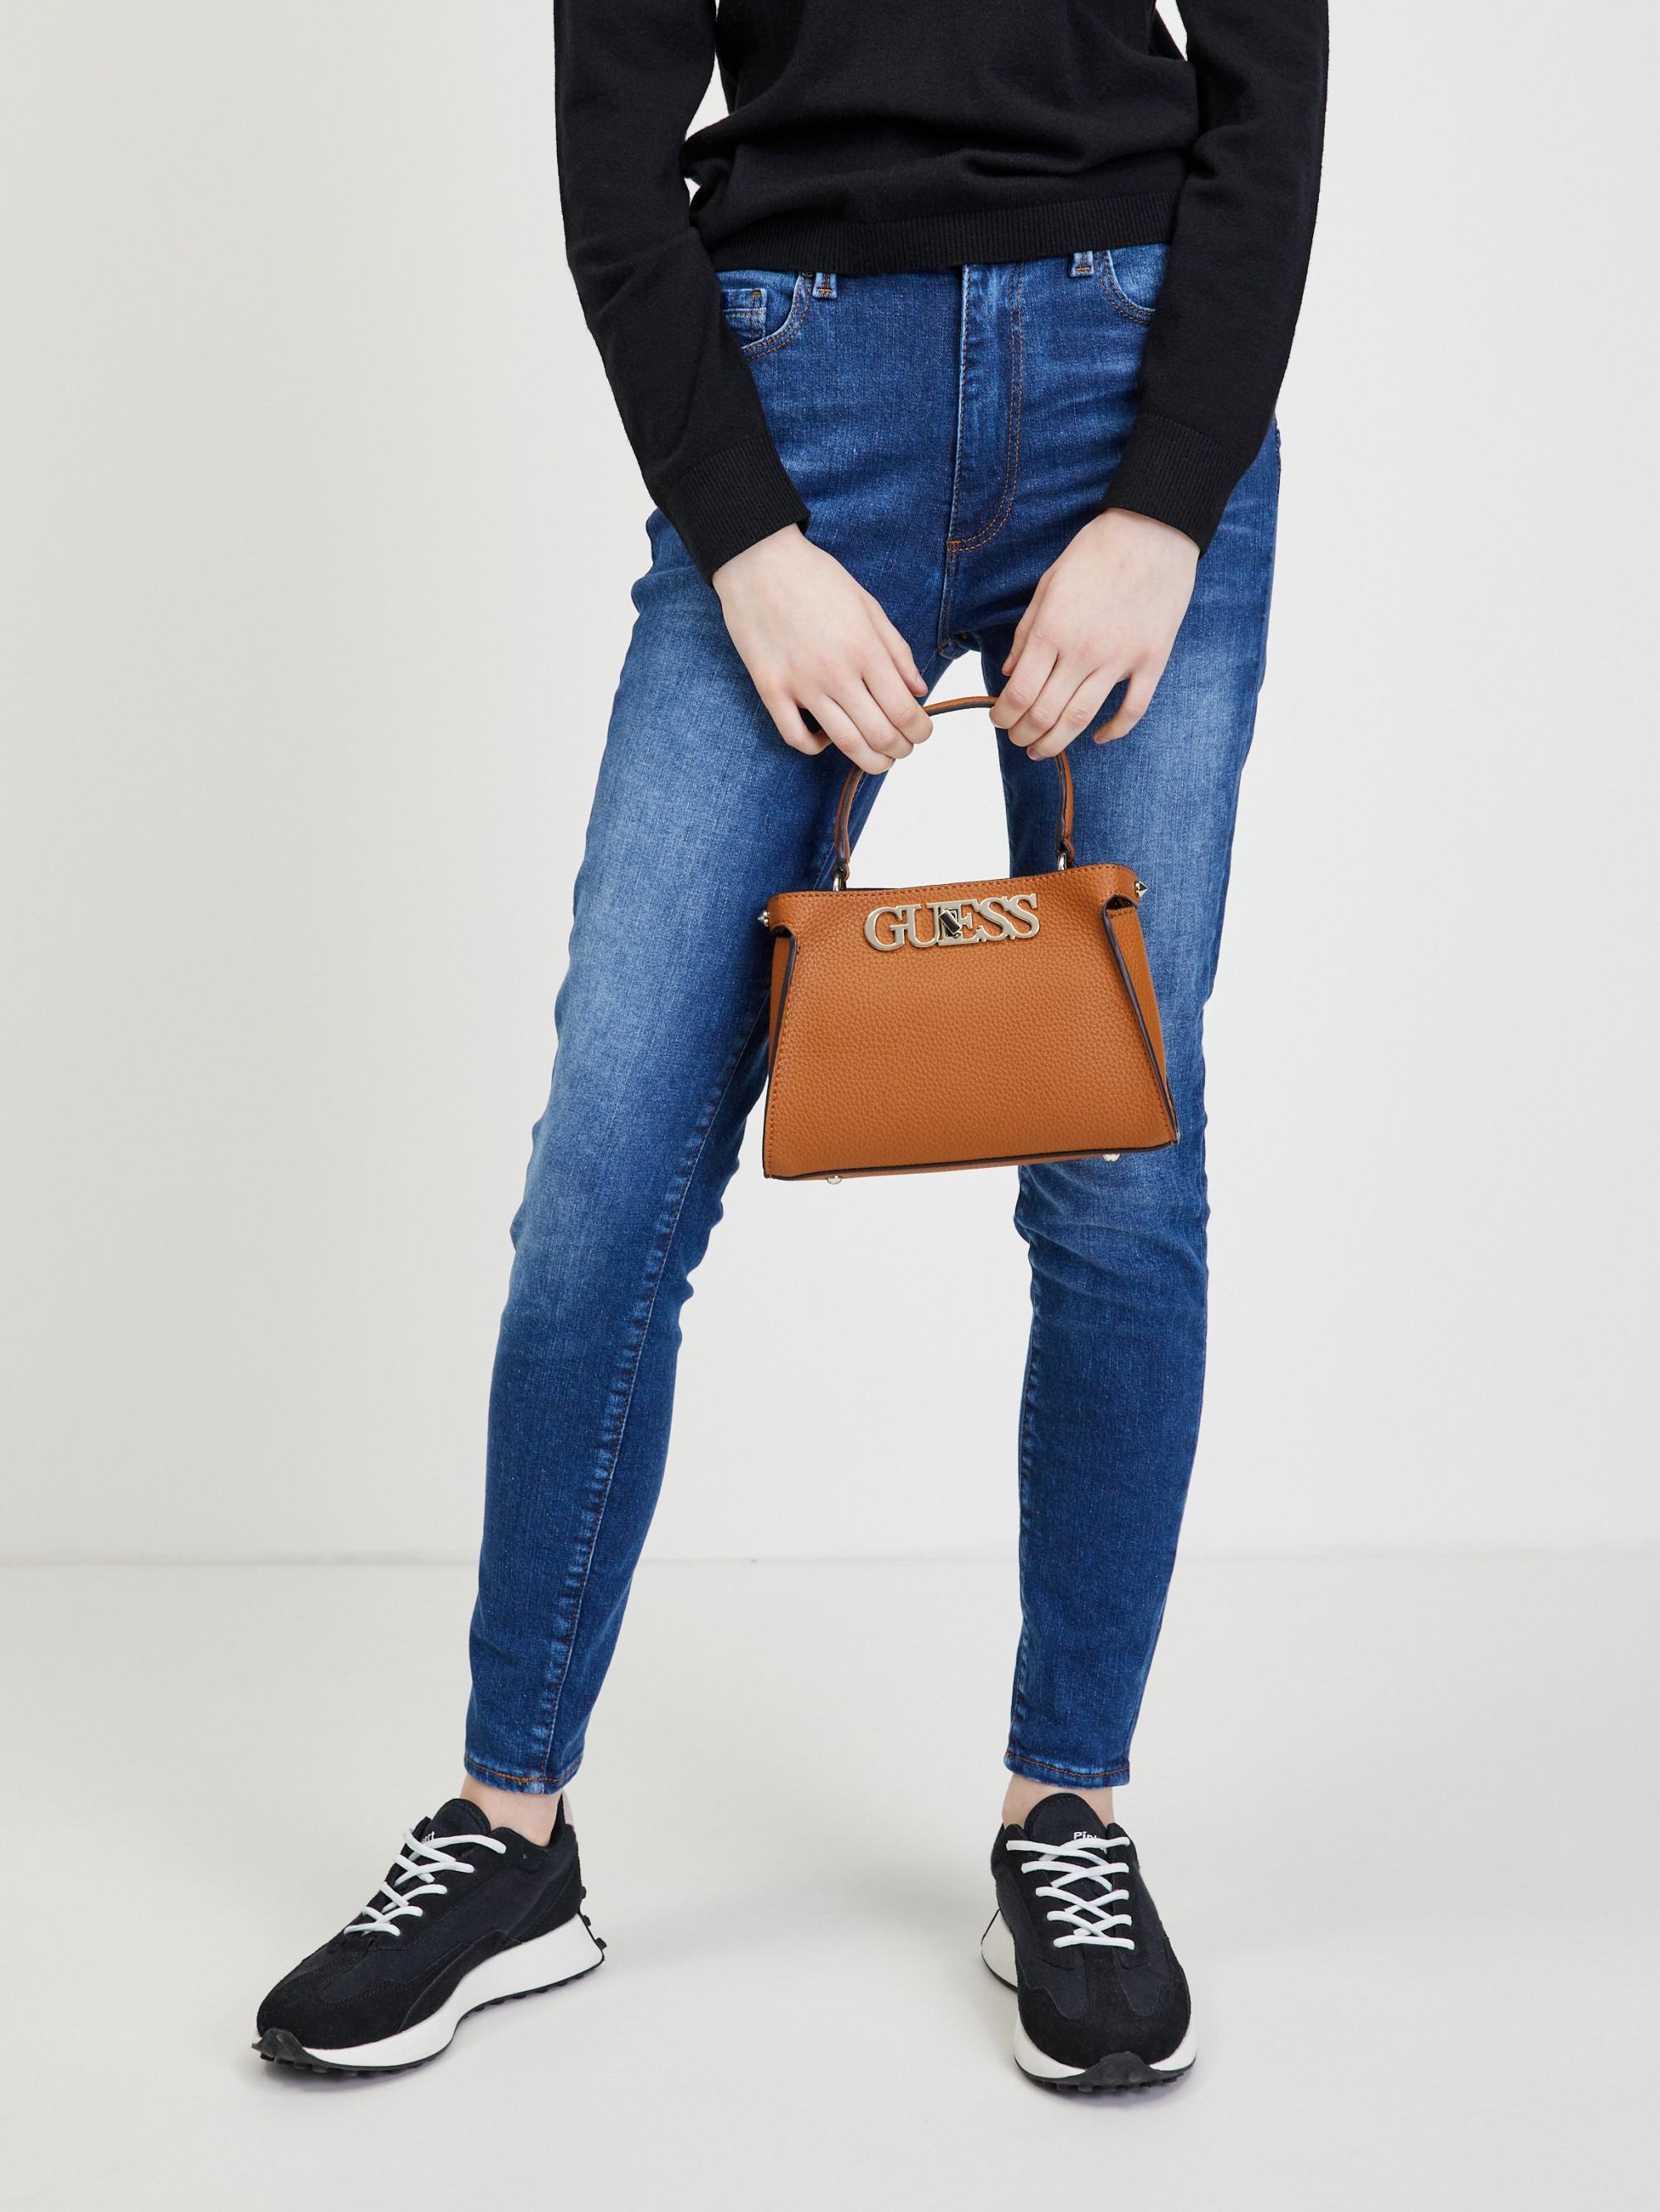 Guess brown handbag Uptown Chic Small